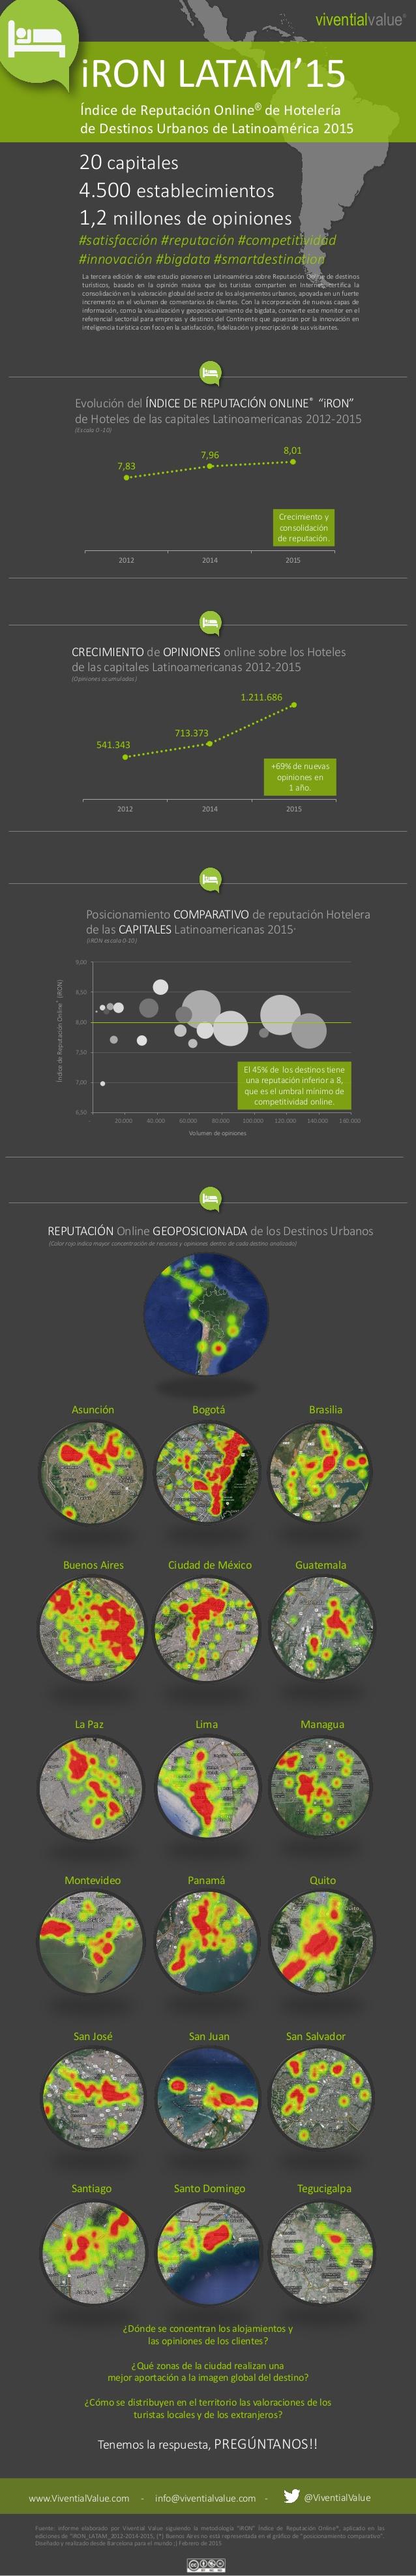 infografa-ndice-de-reputacin-online-de-hoteles-de-destinos-de-latinoamrica-2015-1-638